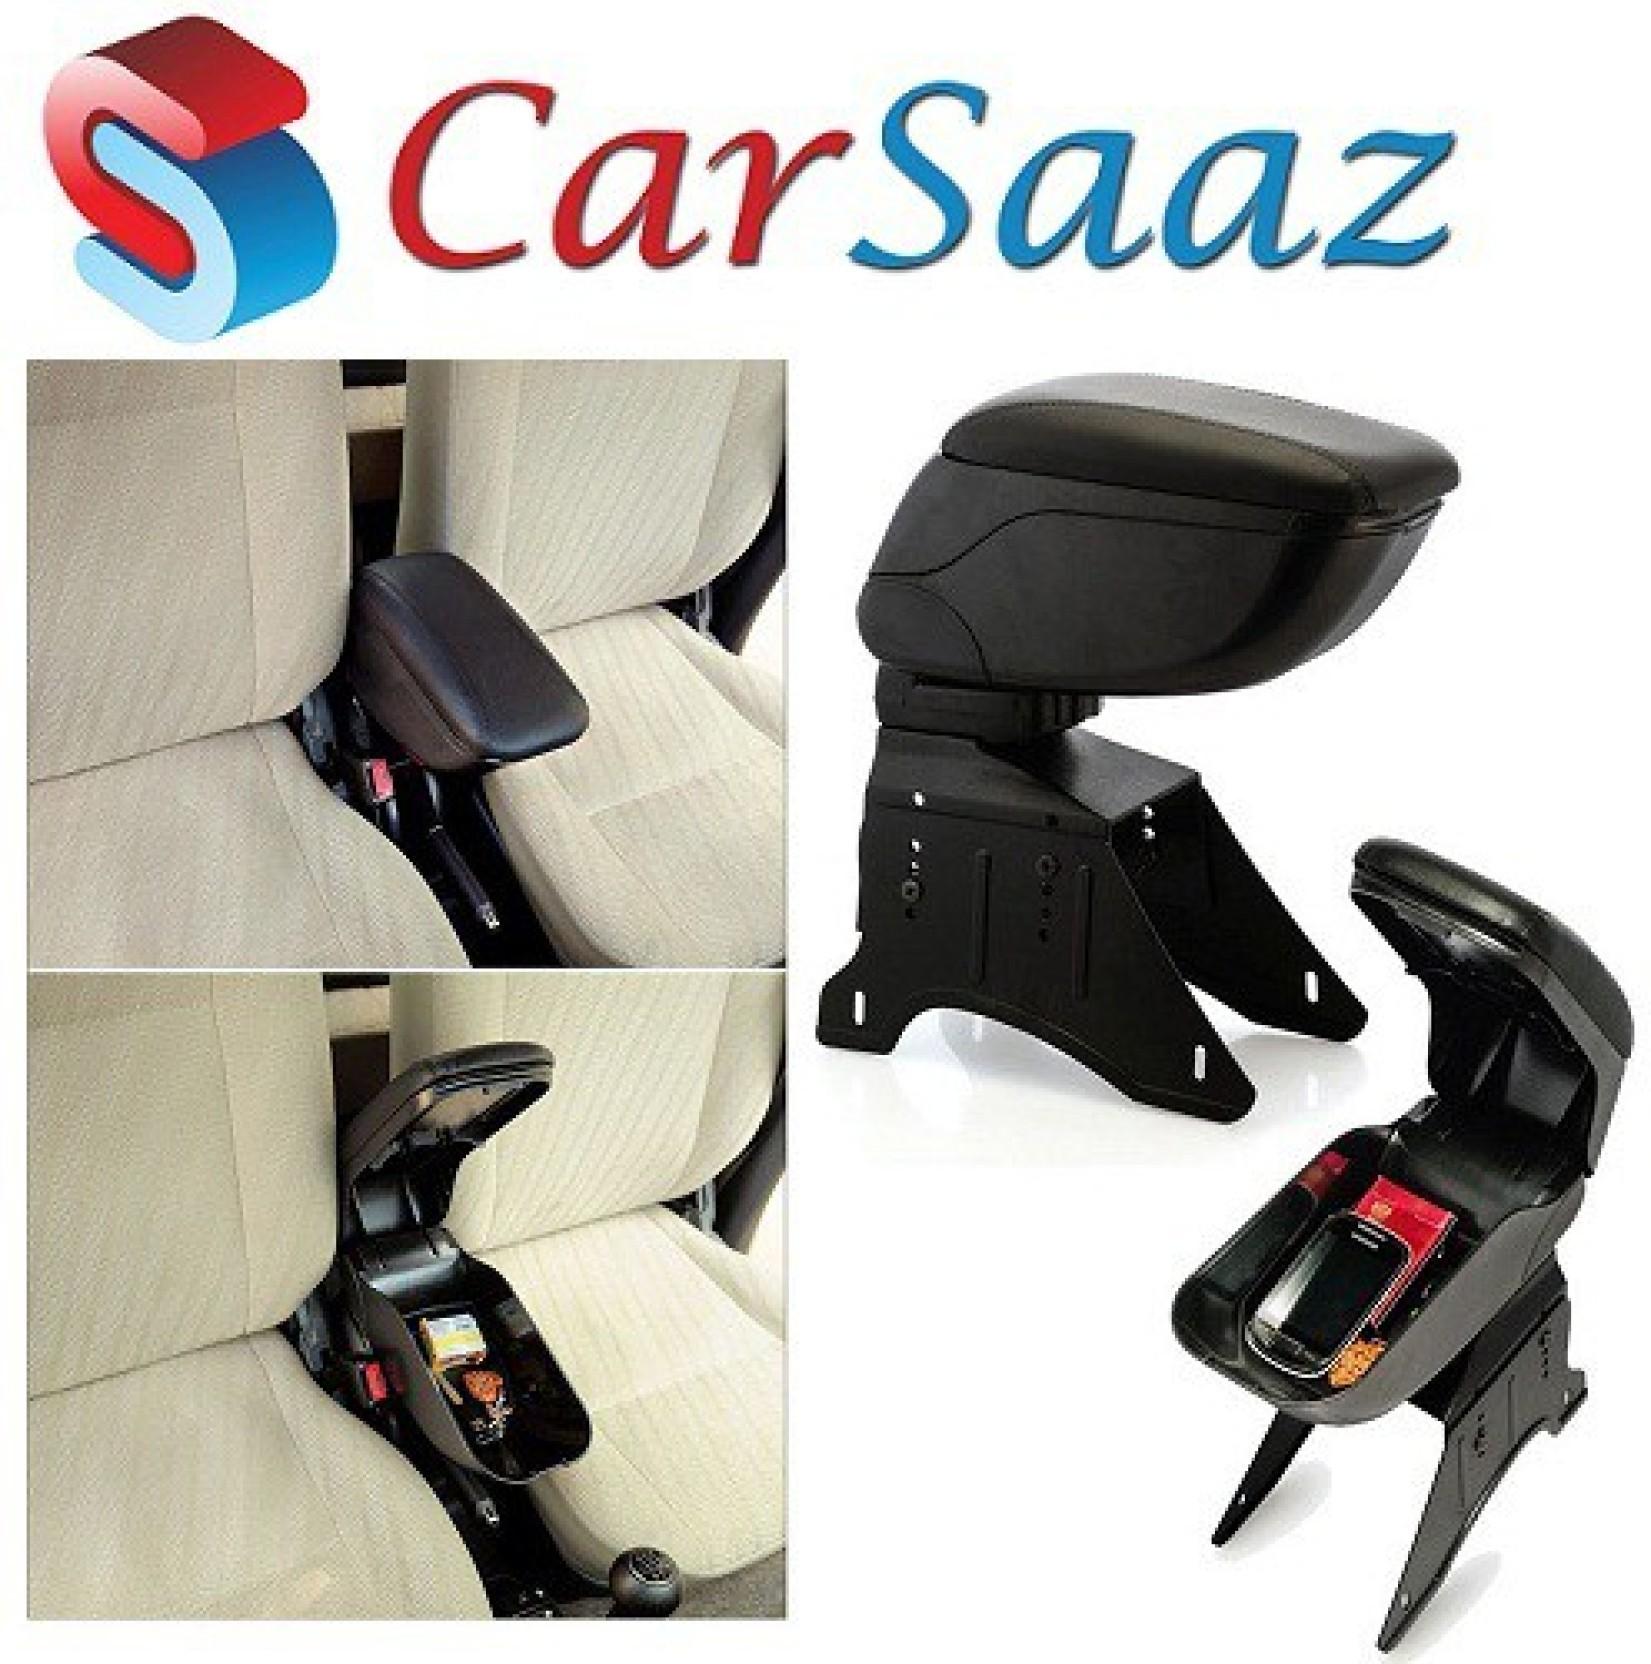 Carsaaz RK1923 Car Armrest Price in India - Buy Carsaaz